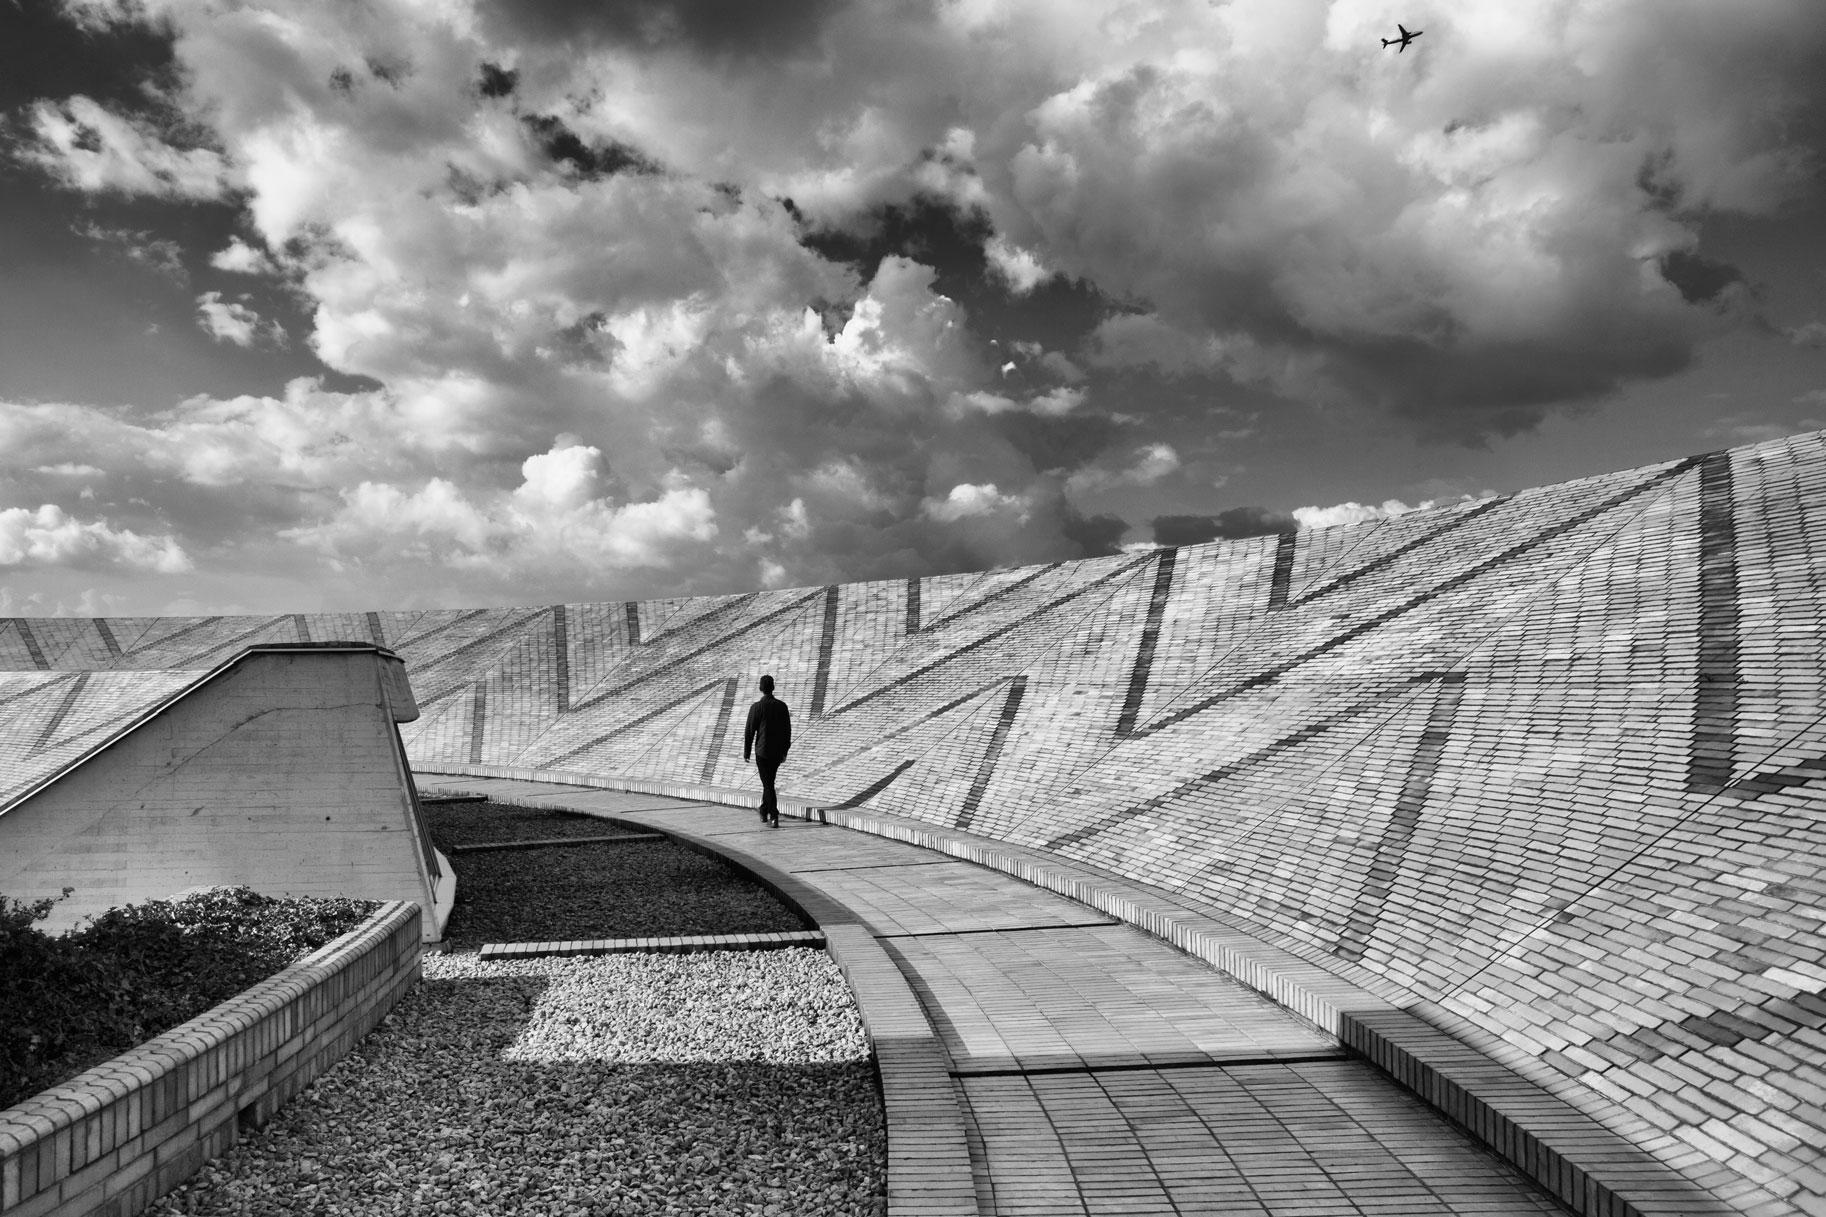 13-simonbosch photography-simon-bosch-architectuur-architecture-bogota-colombia-ArchDaily-Biblioteca Publica Virgilio Barco